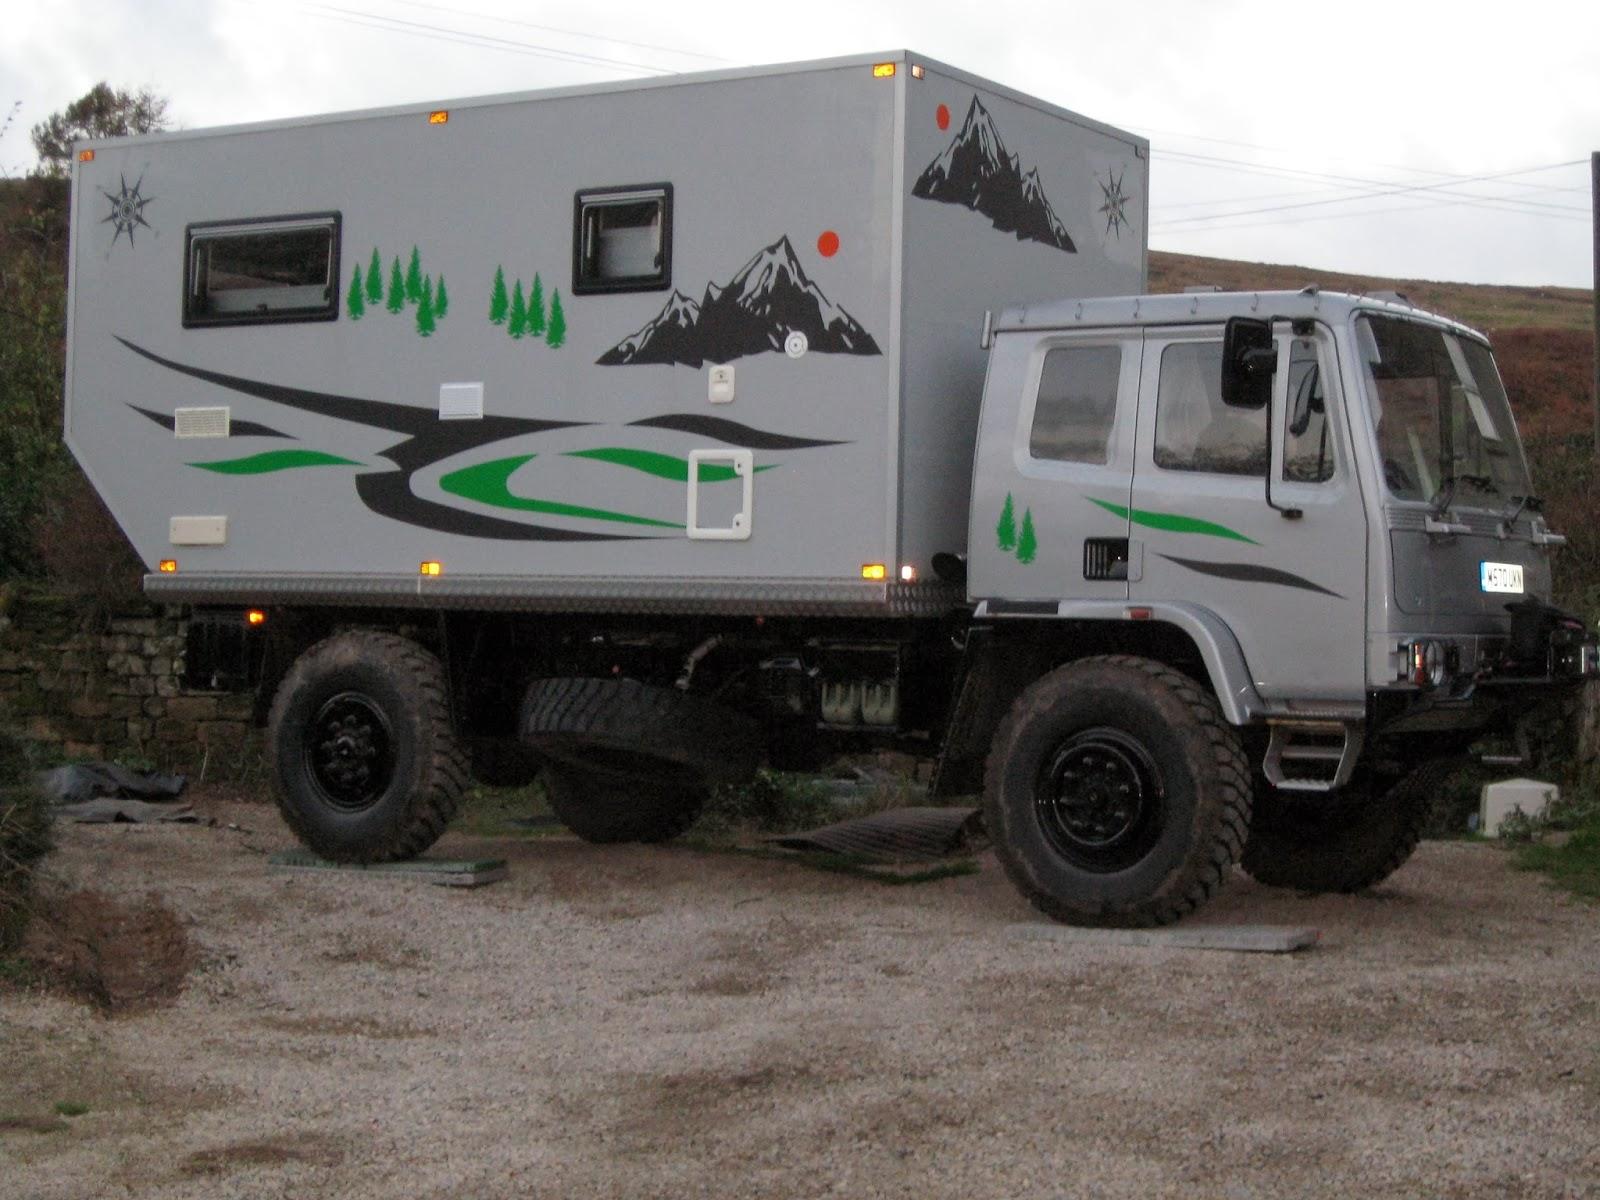 Military Truck Converted To Camper >> Hiace Hobo - Living in a Toyota Camper Van: November 2013